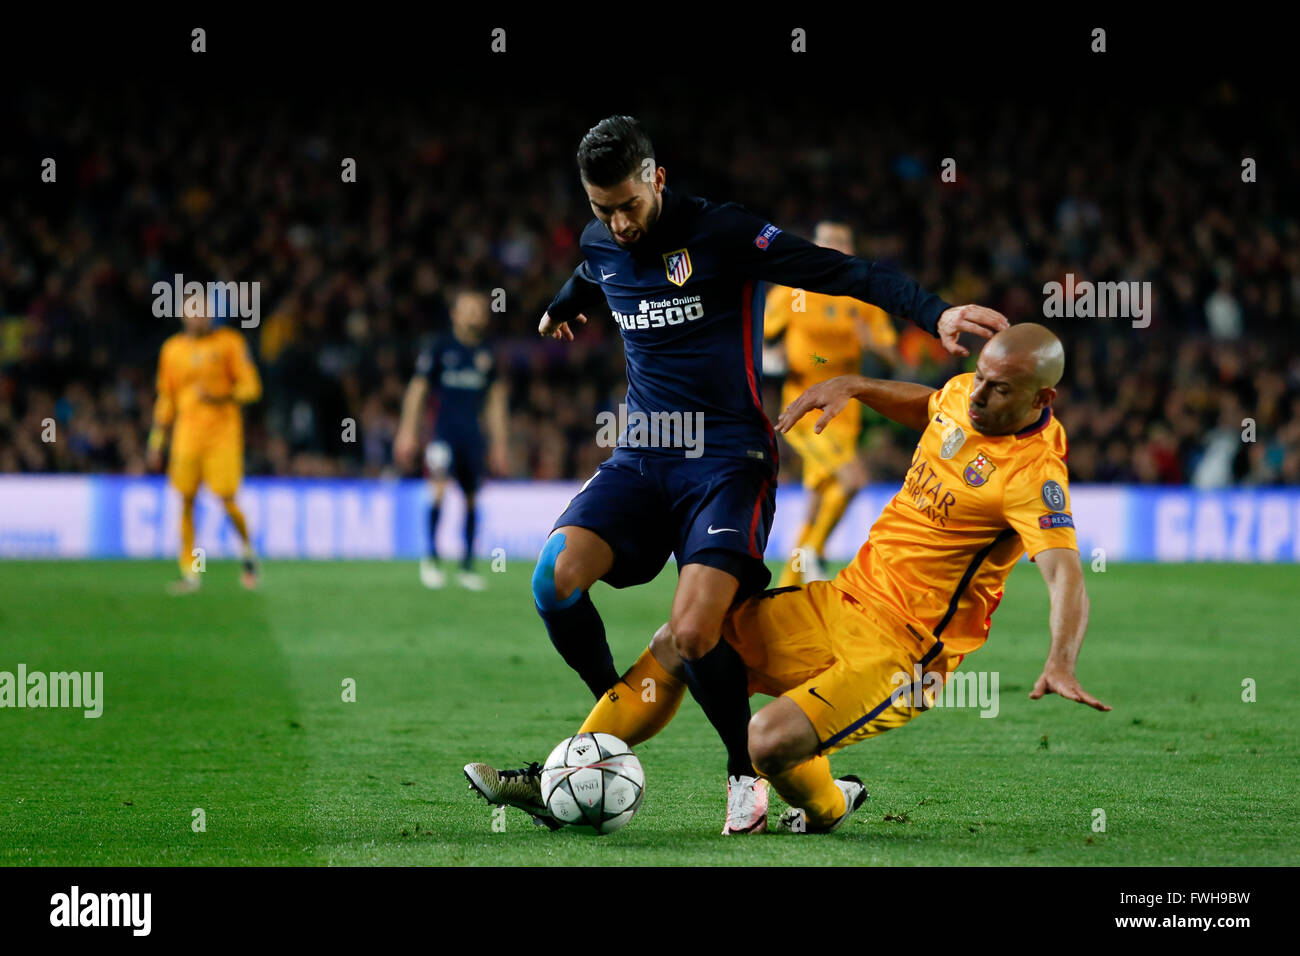 UEFA Champions League Quarter-Finals game between FC Barcelona and Atletico de Madrid. Camp Nou, Barcelona, Spain. - Stock Image